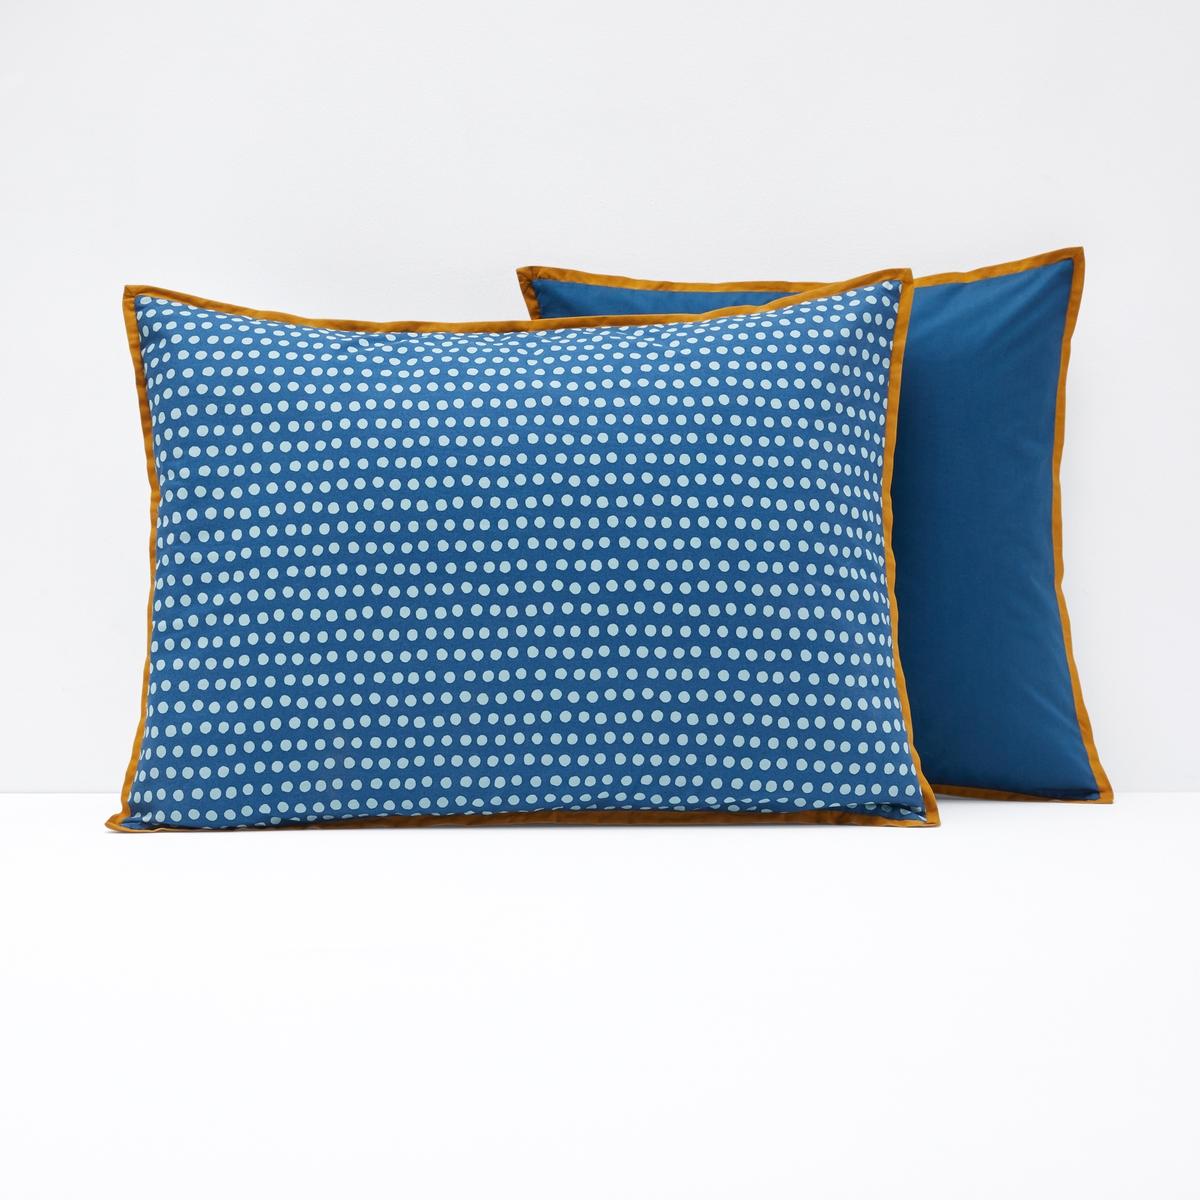 Наволочка на подушку-валик или на подушку DUO